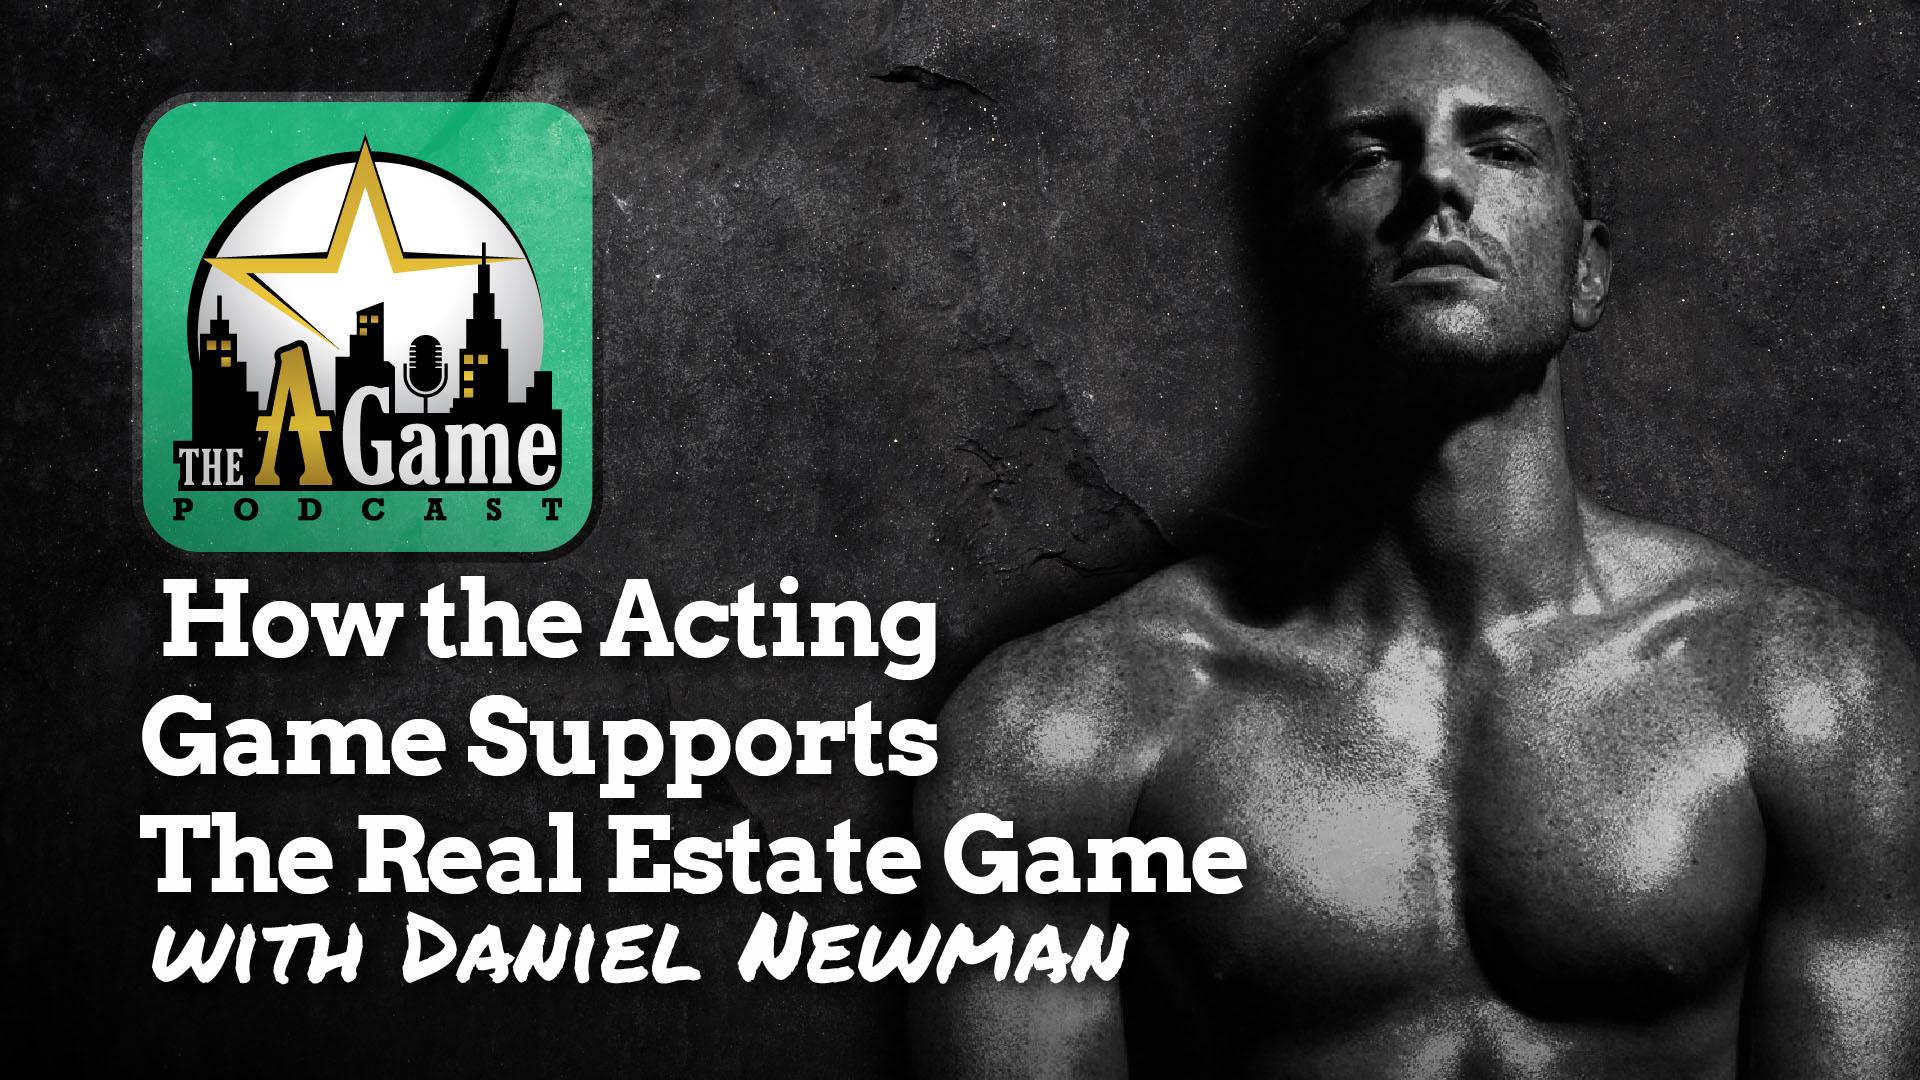 Daniel Newman A Game Podcast